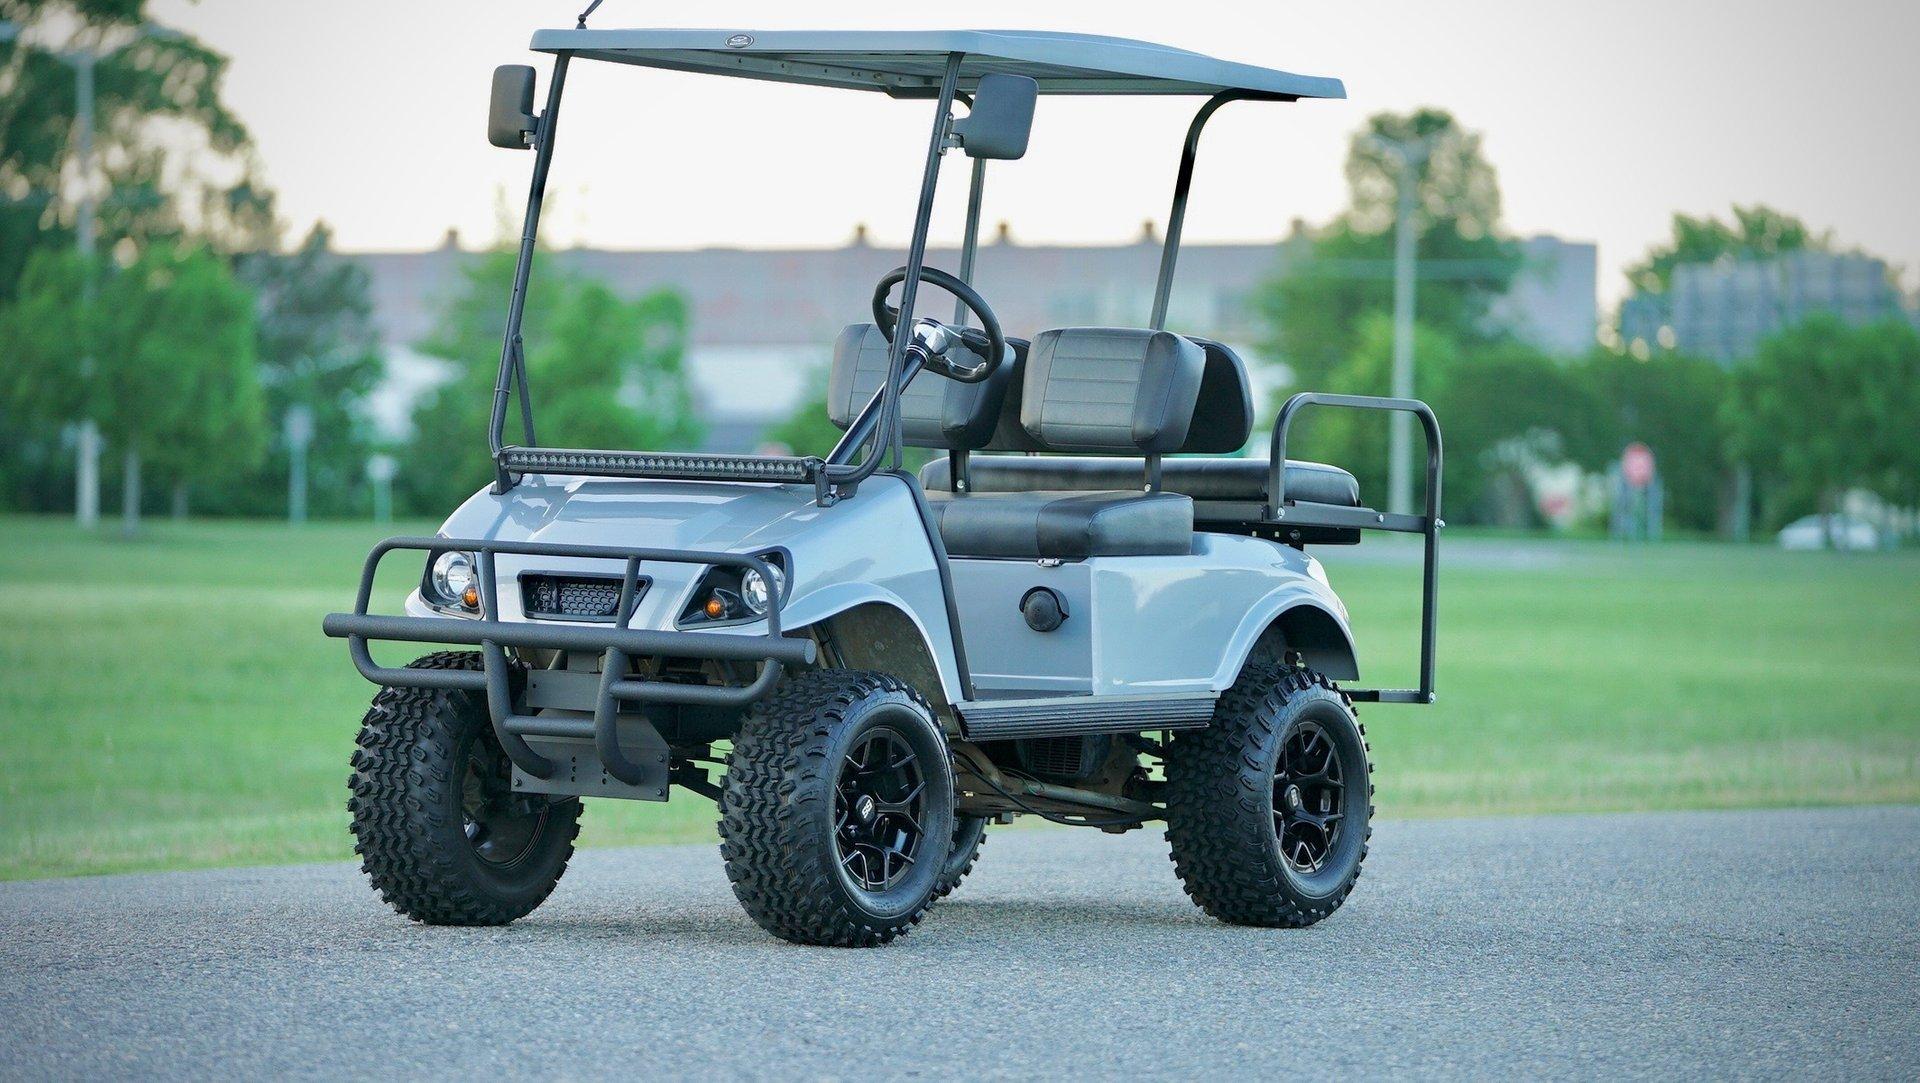 Club cart golf cart